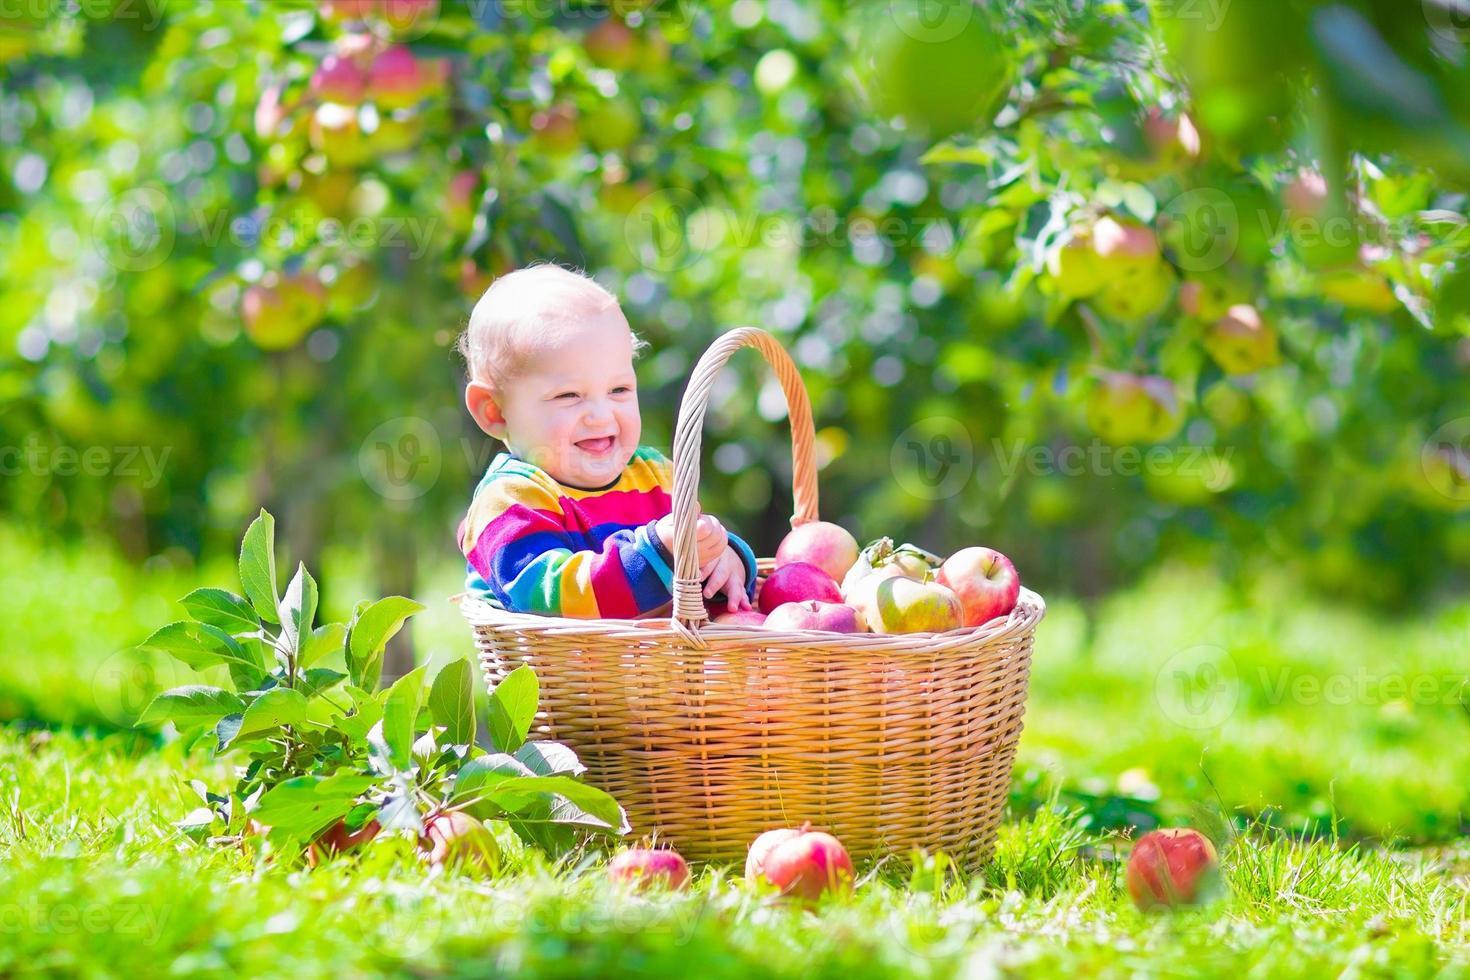 Baby in einem Apfelkorb foto